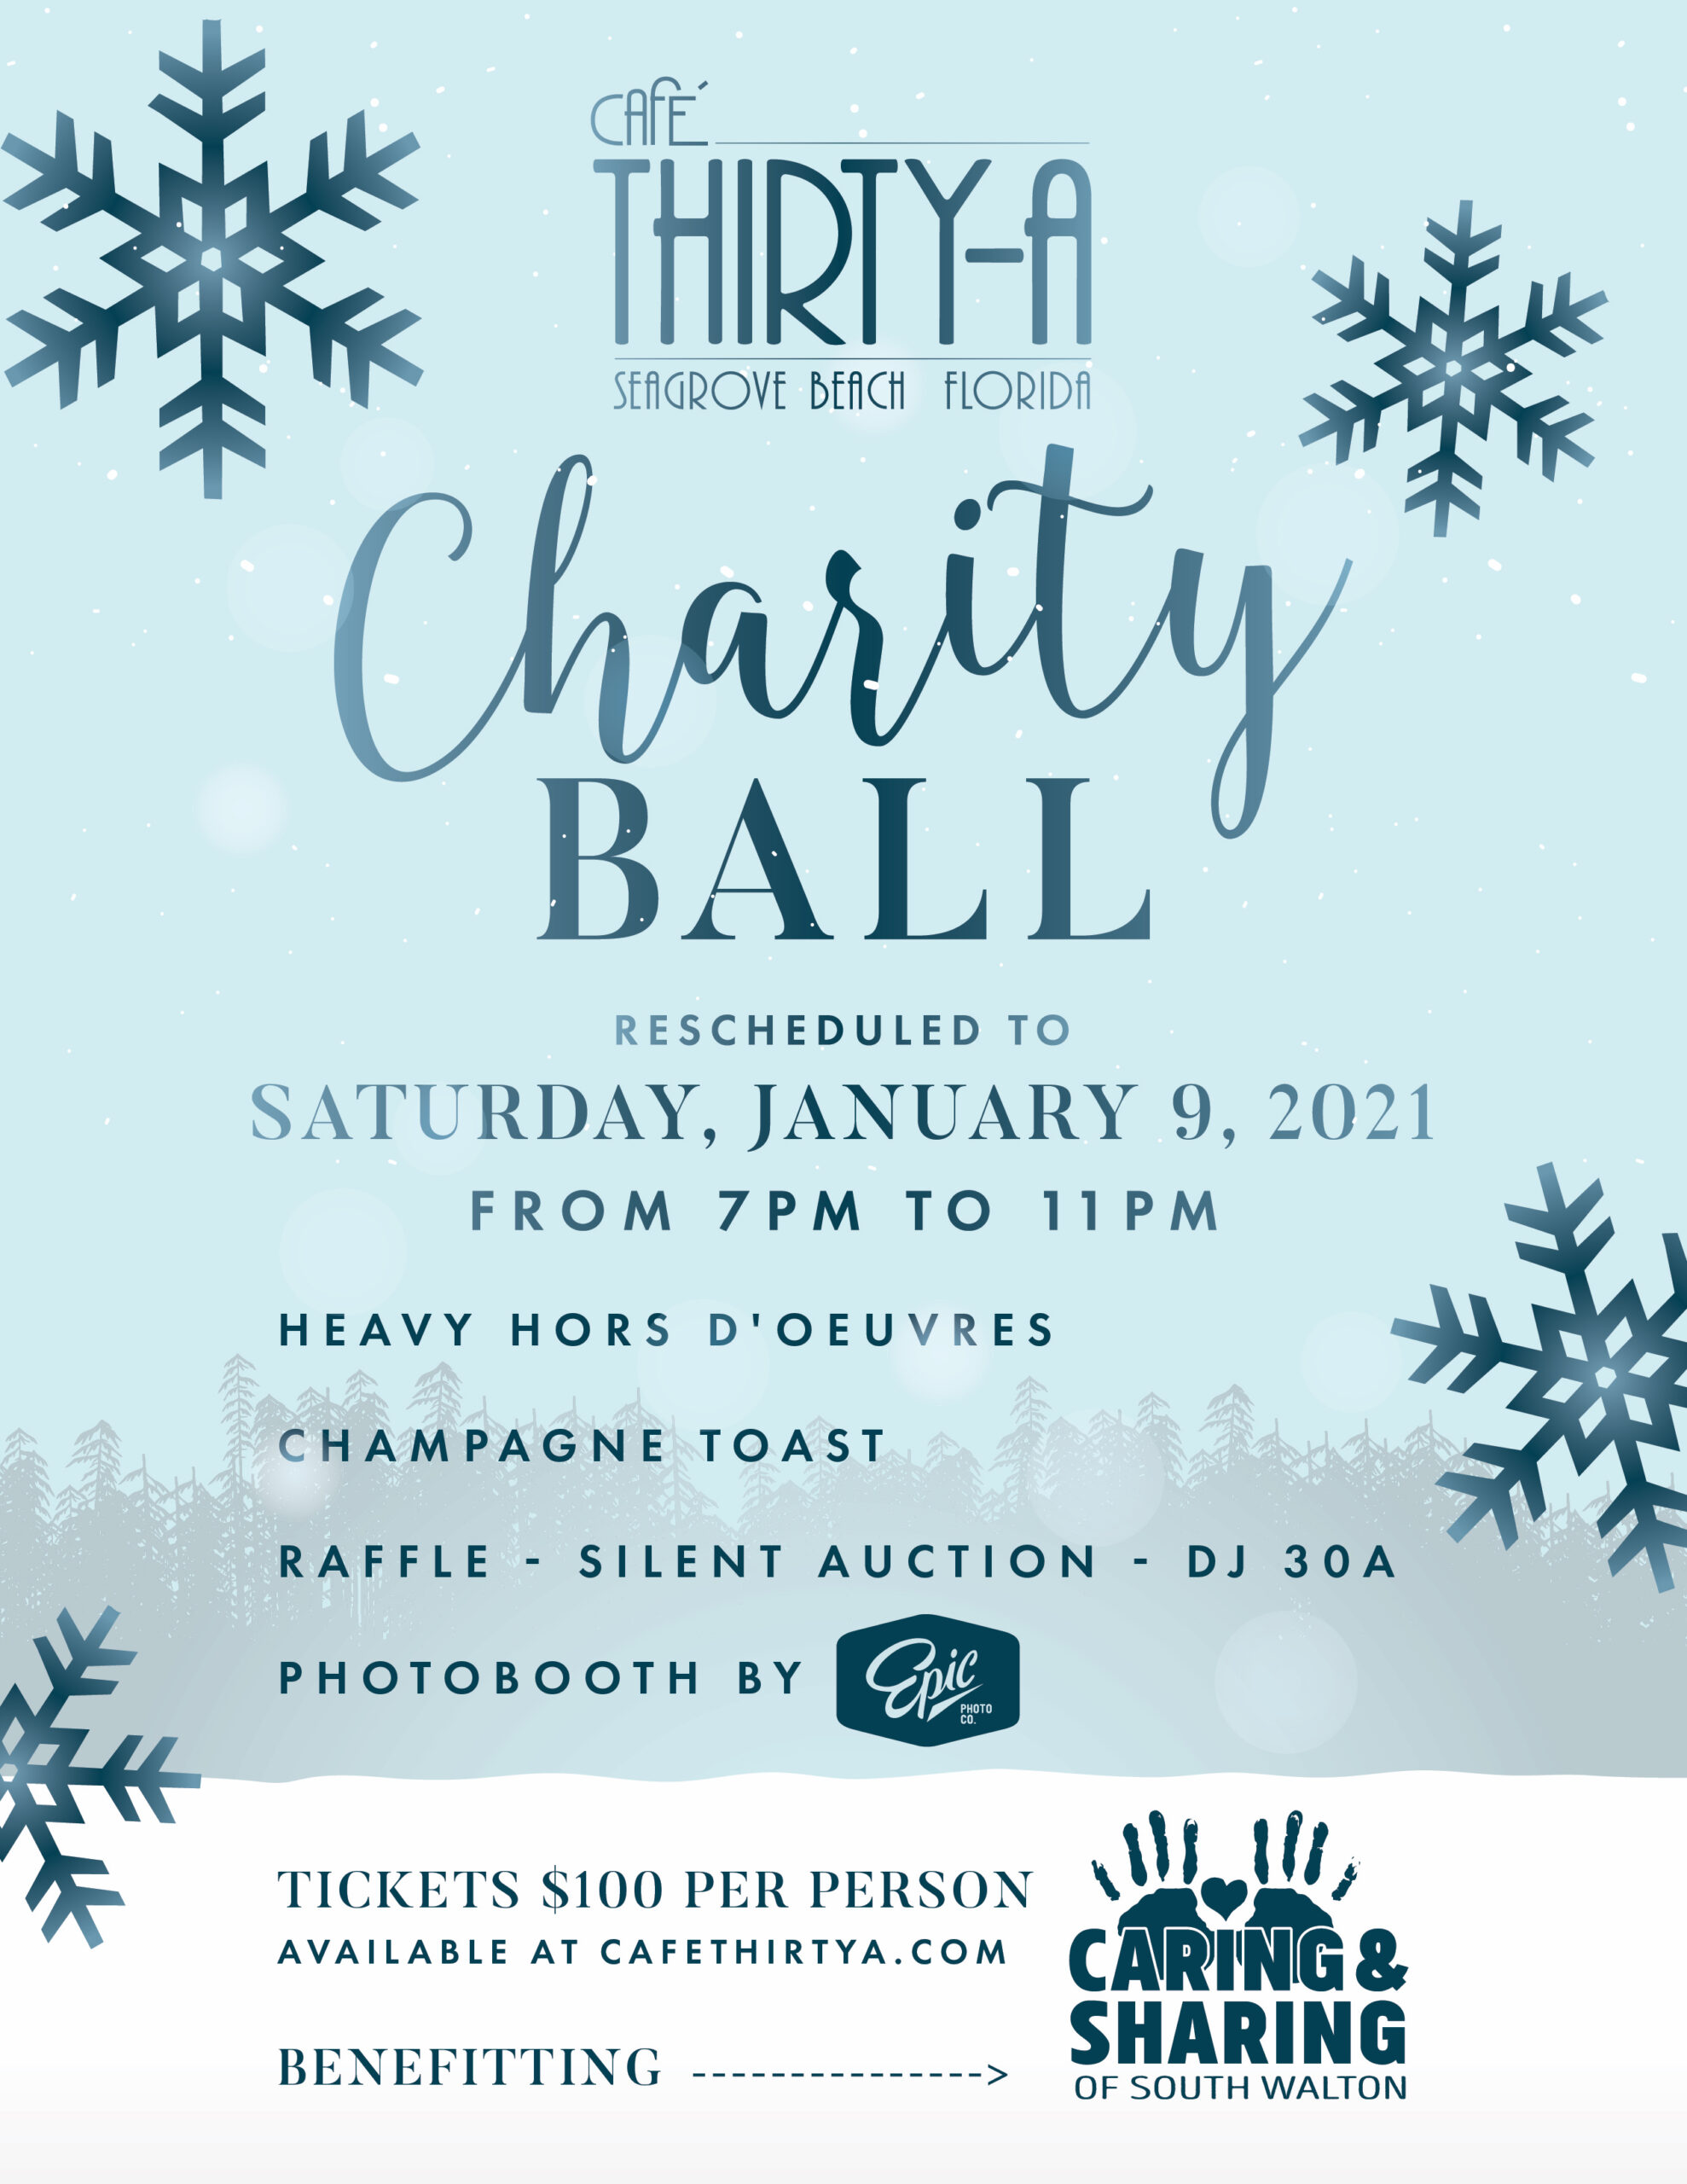 Café Thirty-A Reschedules Annual Christmas Charity Ball